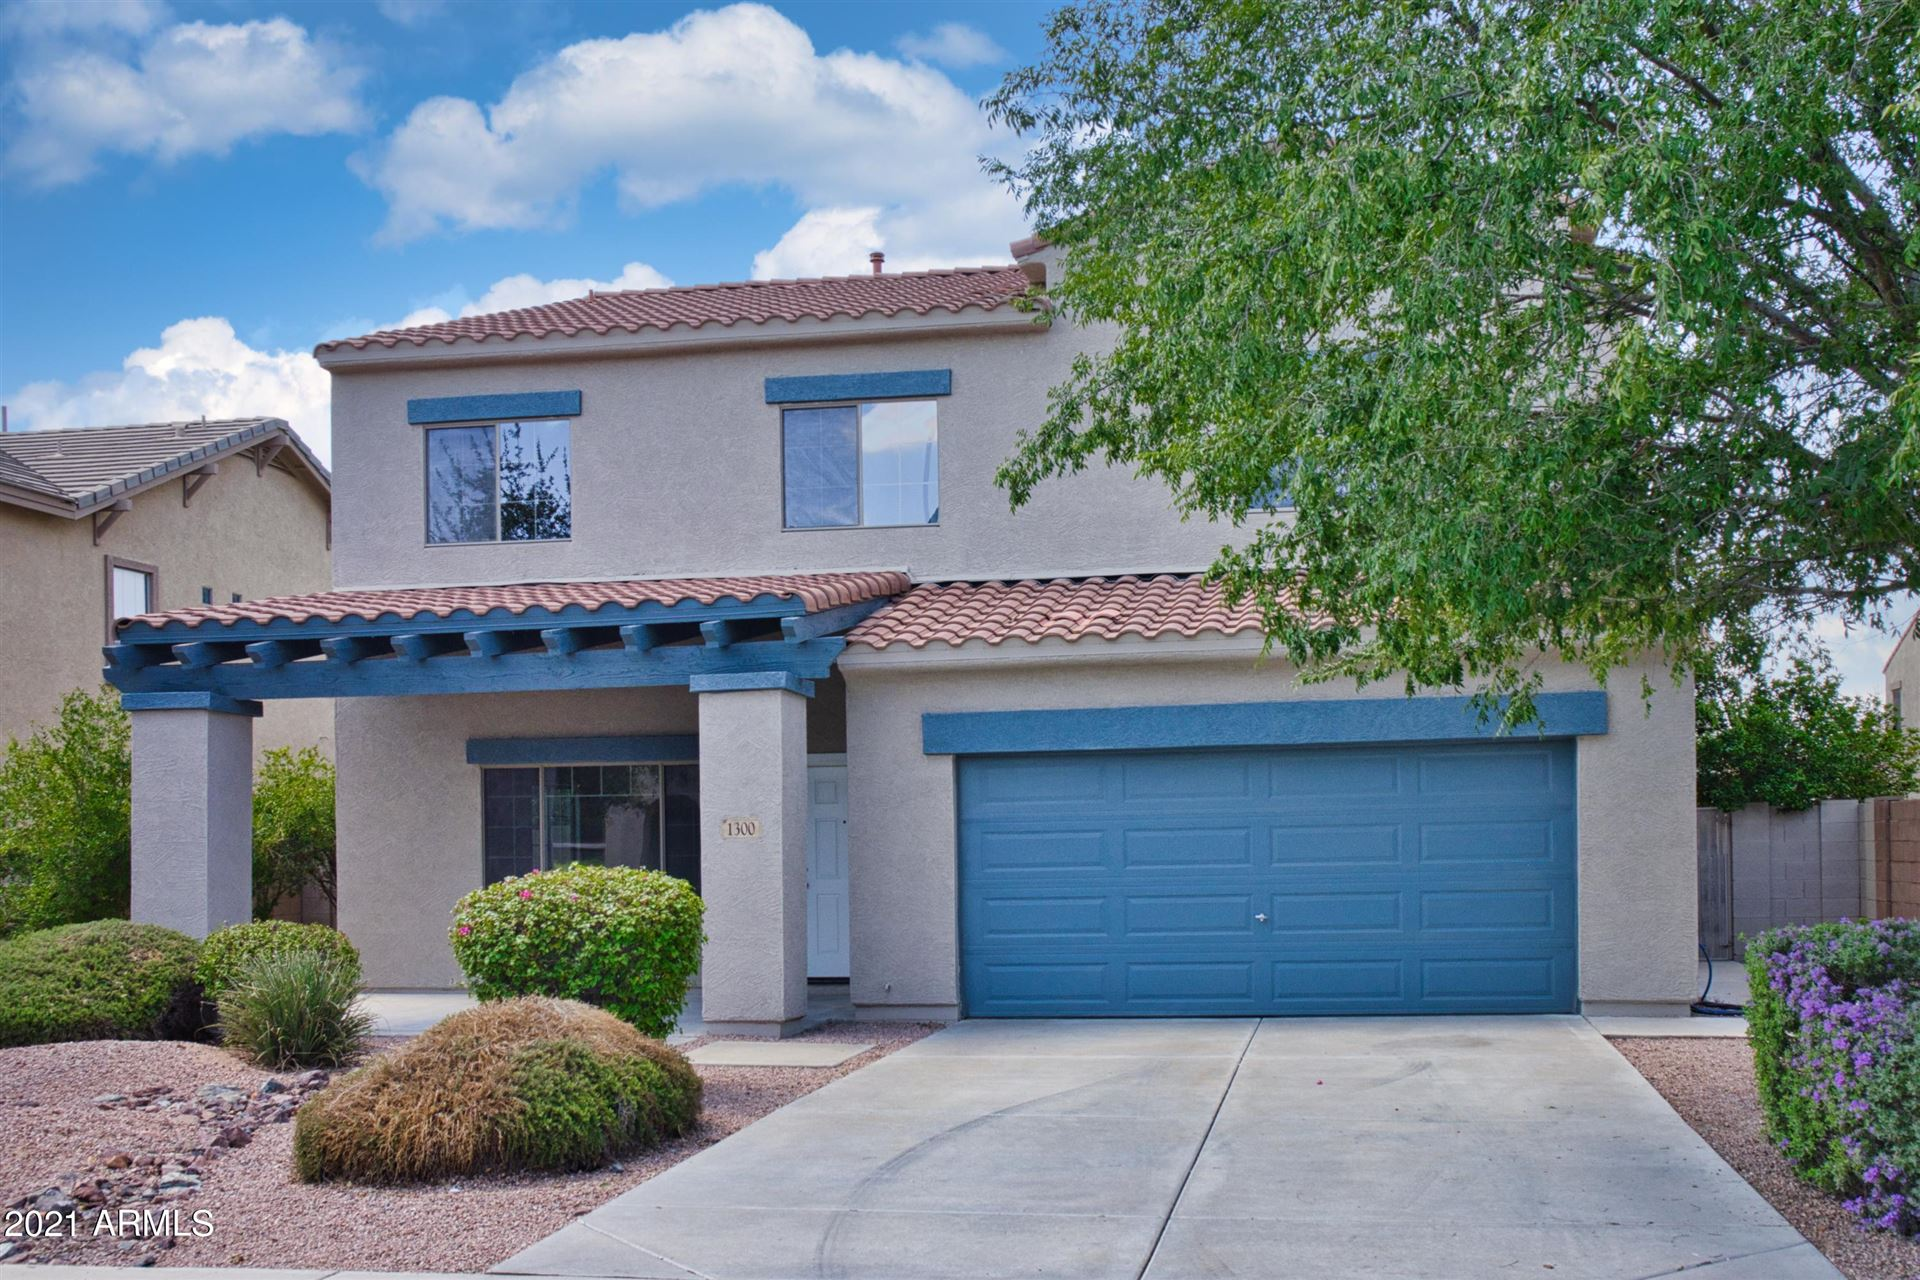 Photo of 1300 E PARKVIEW Drive, Gilbert, AZ 85295 (MLS # 6253637)